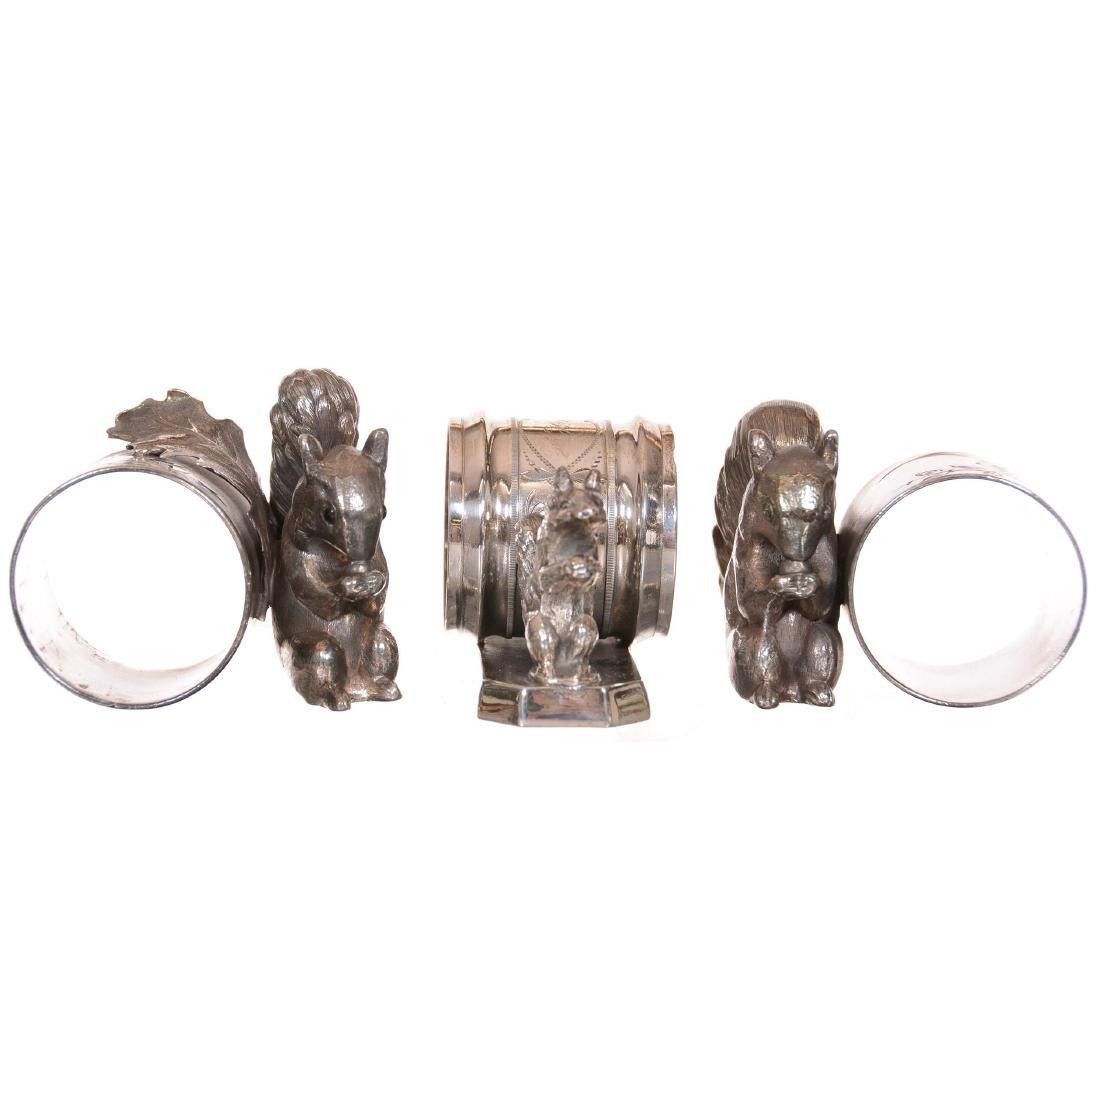 (3) Silverplate Victorian Napkin Rings